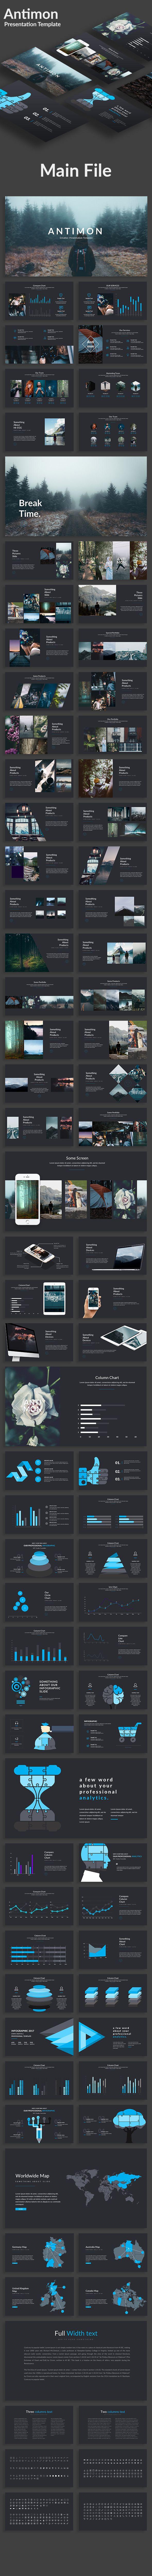 Antimon Creative Powerpoint Template - Creative PowerPoint Templates